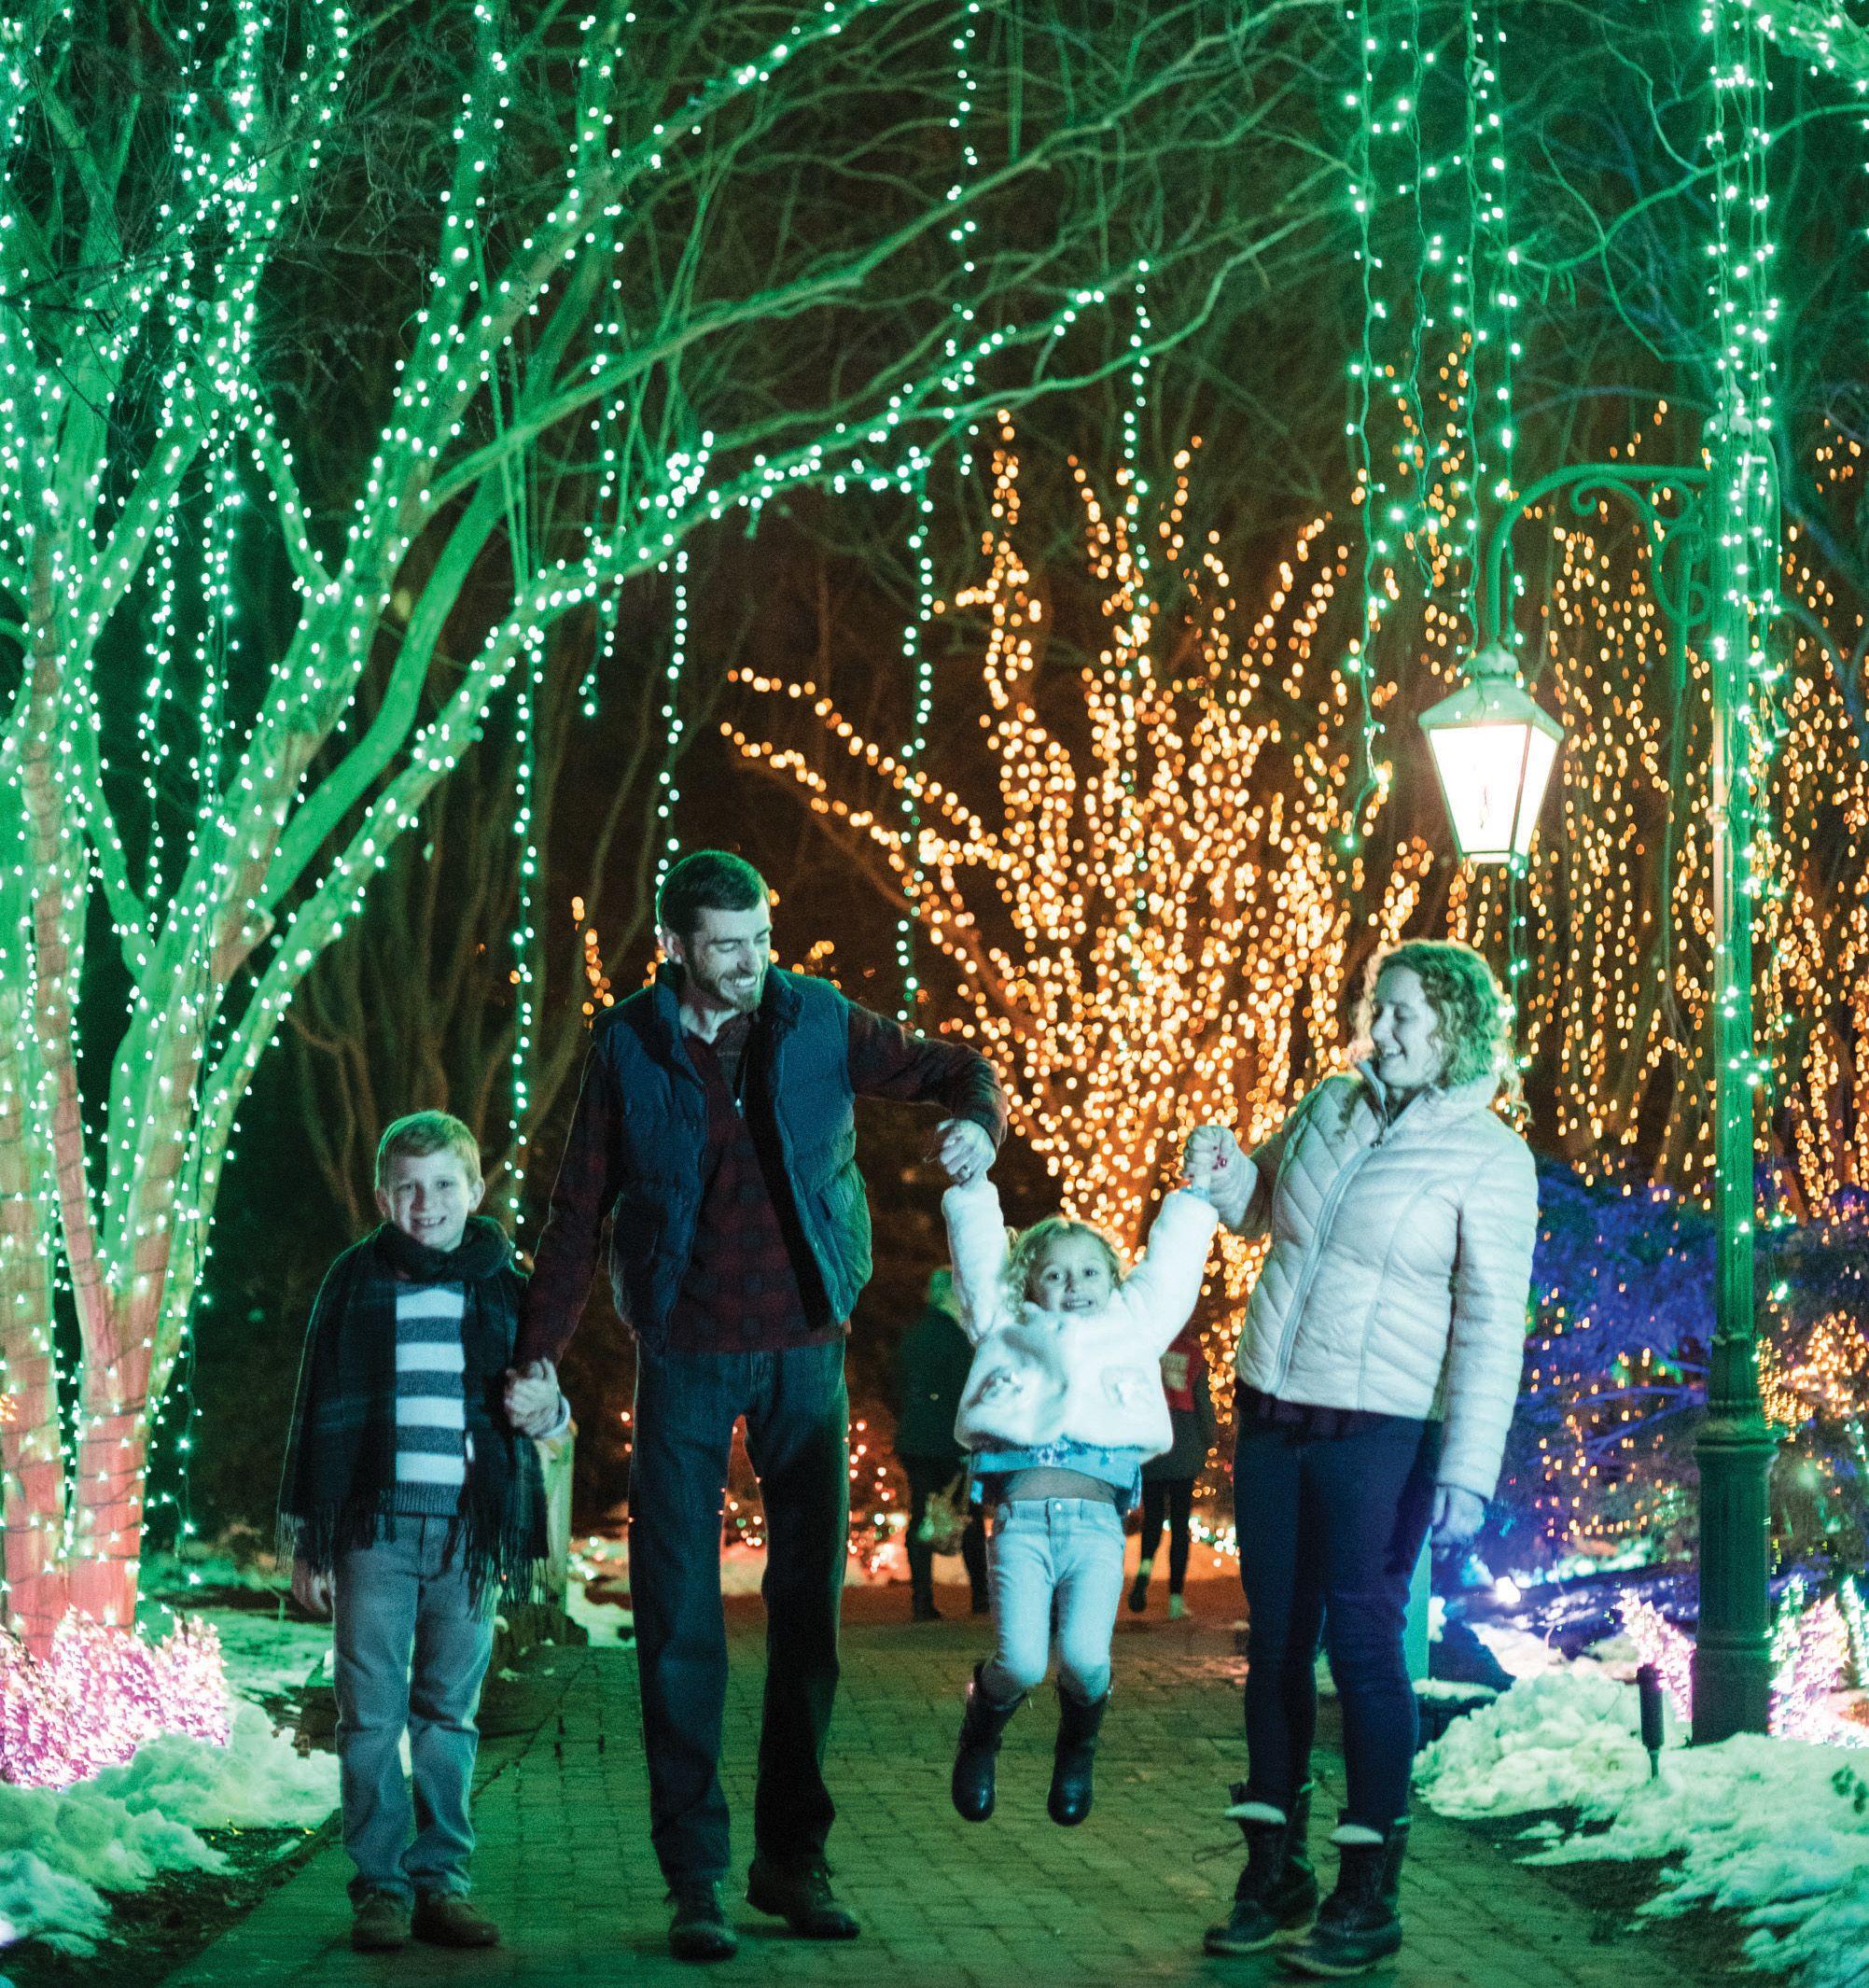 Dominion GardenFest of Lights at Botanical gardens